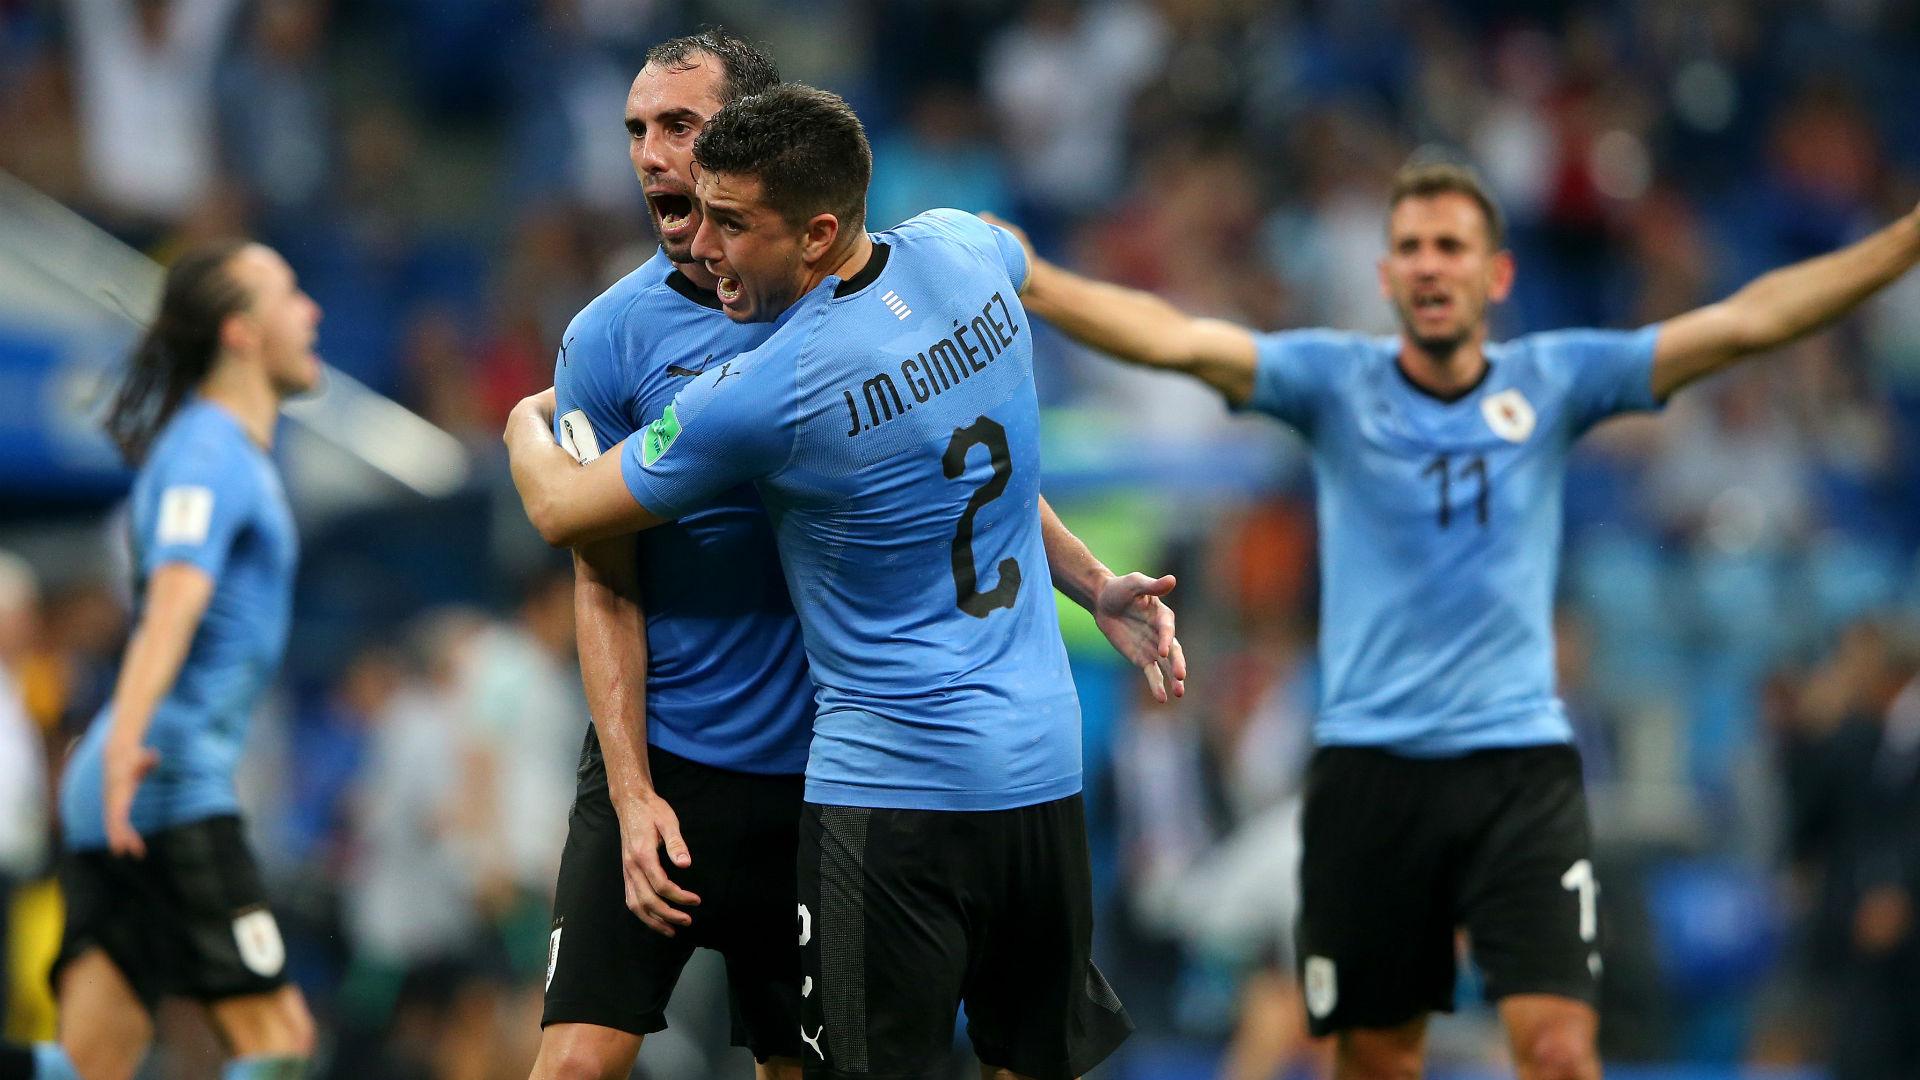 L'Argentin Nestor Pitana désigné arbitre de Uruguay-France